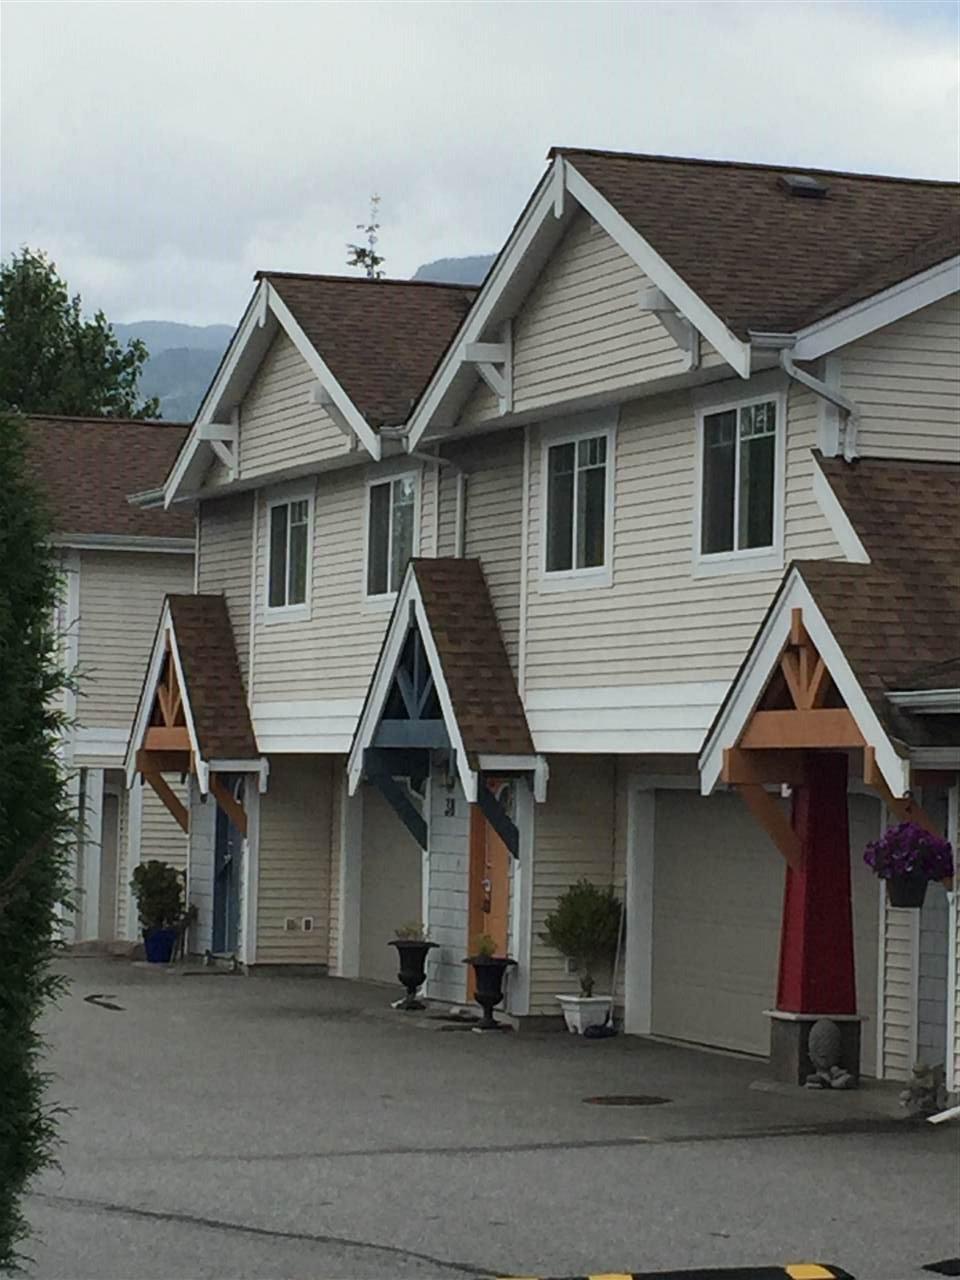 Main Photo: 46 1821 WILLOW CRESCENT in Squamish: Garibaldi Estates Townhouse for sale : MLS®# R2081102